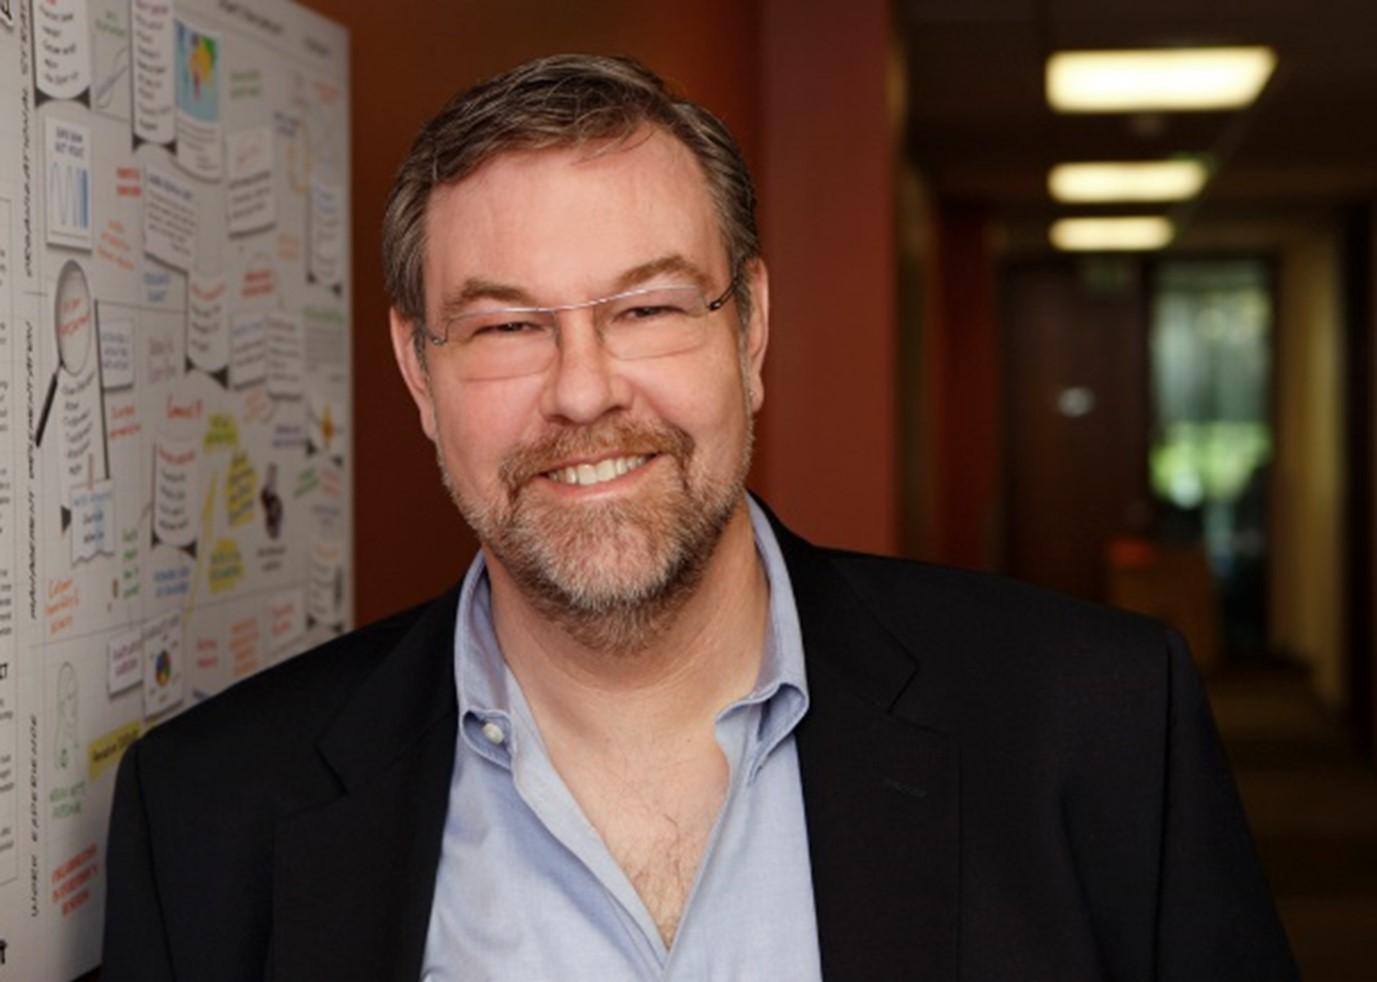 Singularity Digital Enterprise hires ex-Bill Gates advisor, Daniel Rasmus